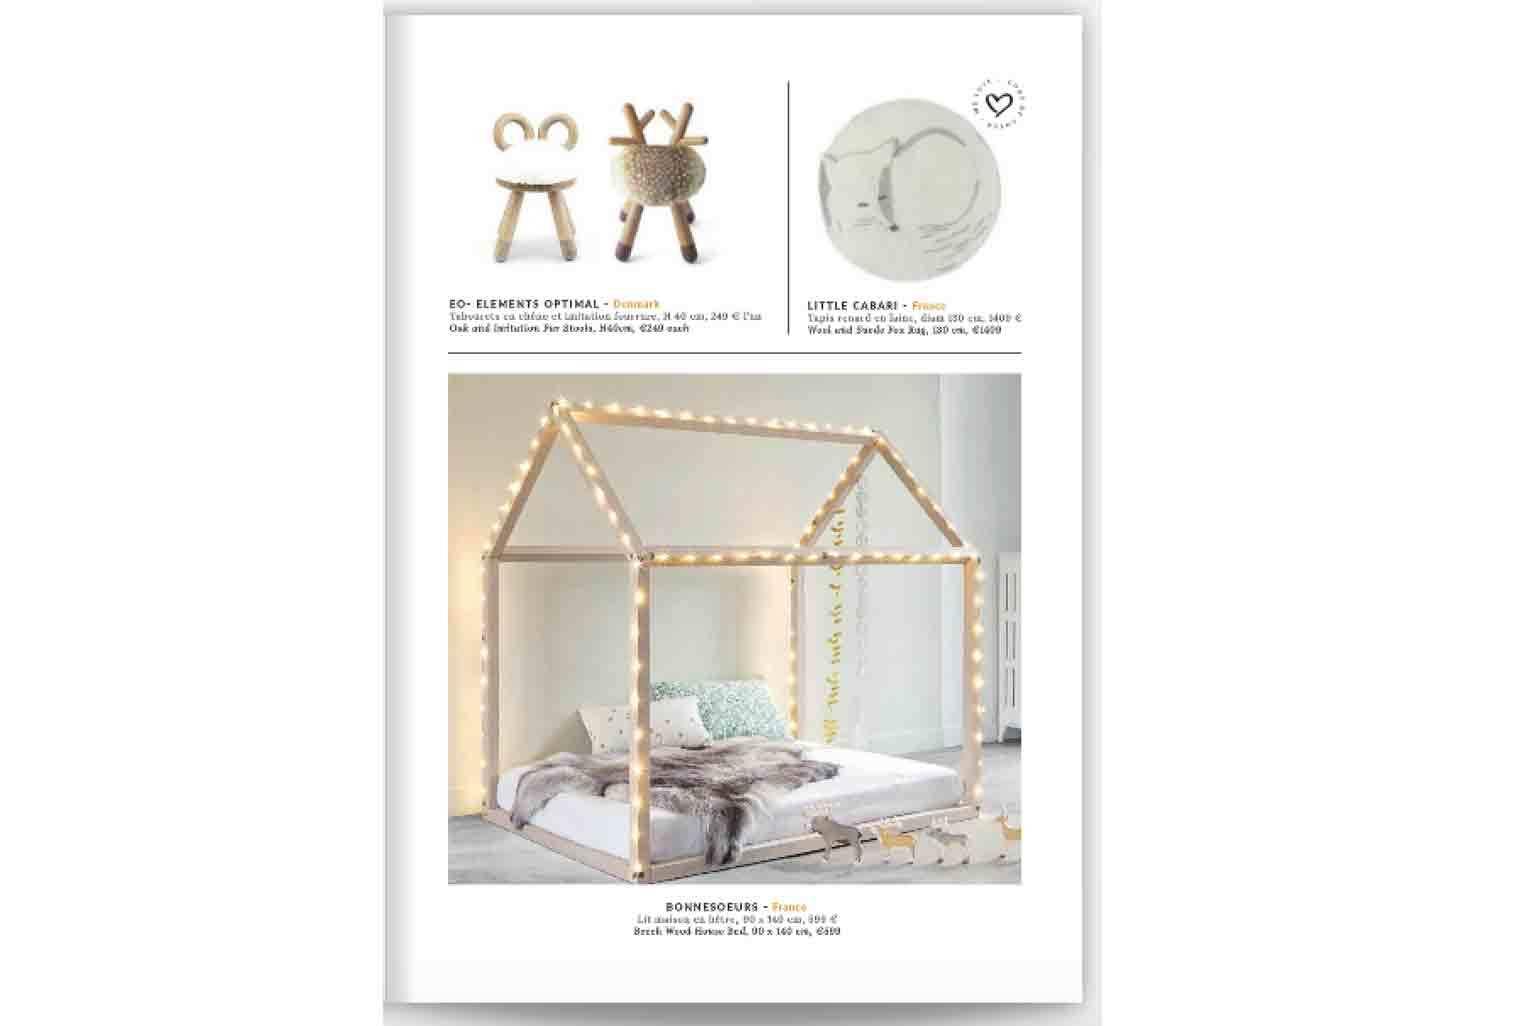 Tapis Kitsuné dans Christmas Guide 2016 - Smallable Store